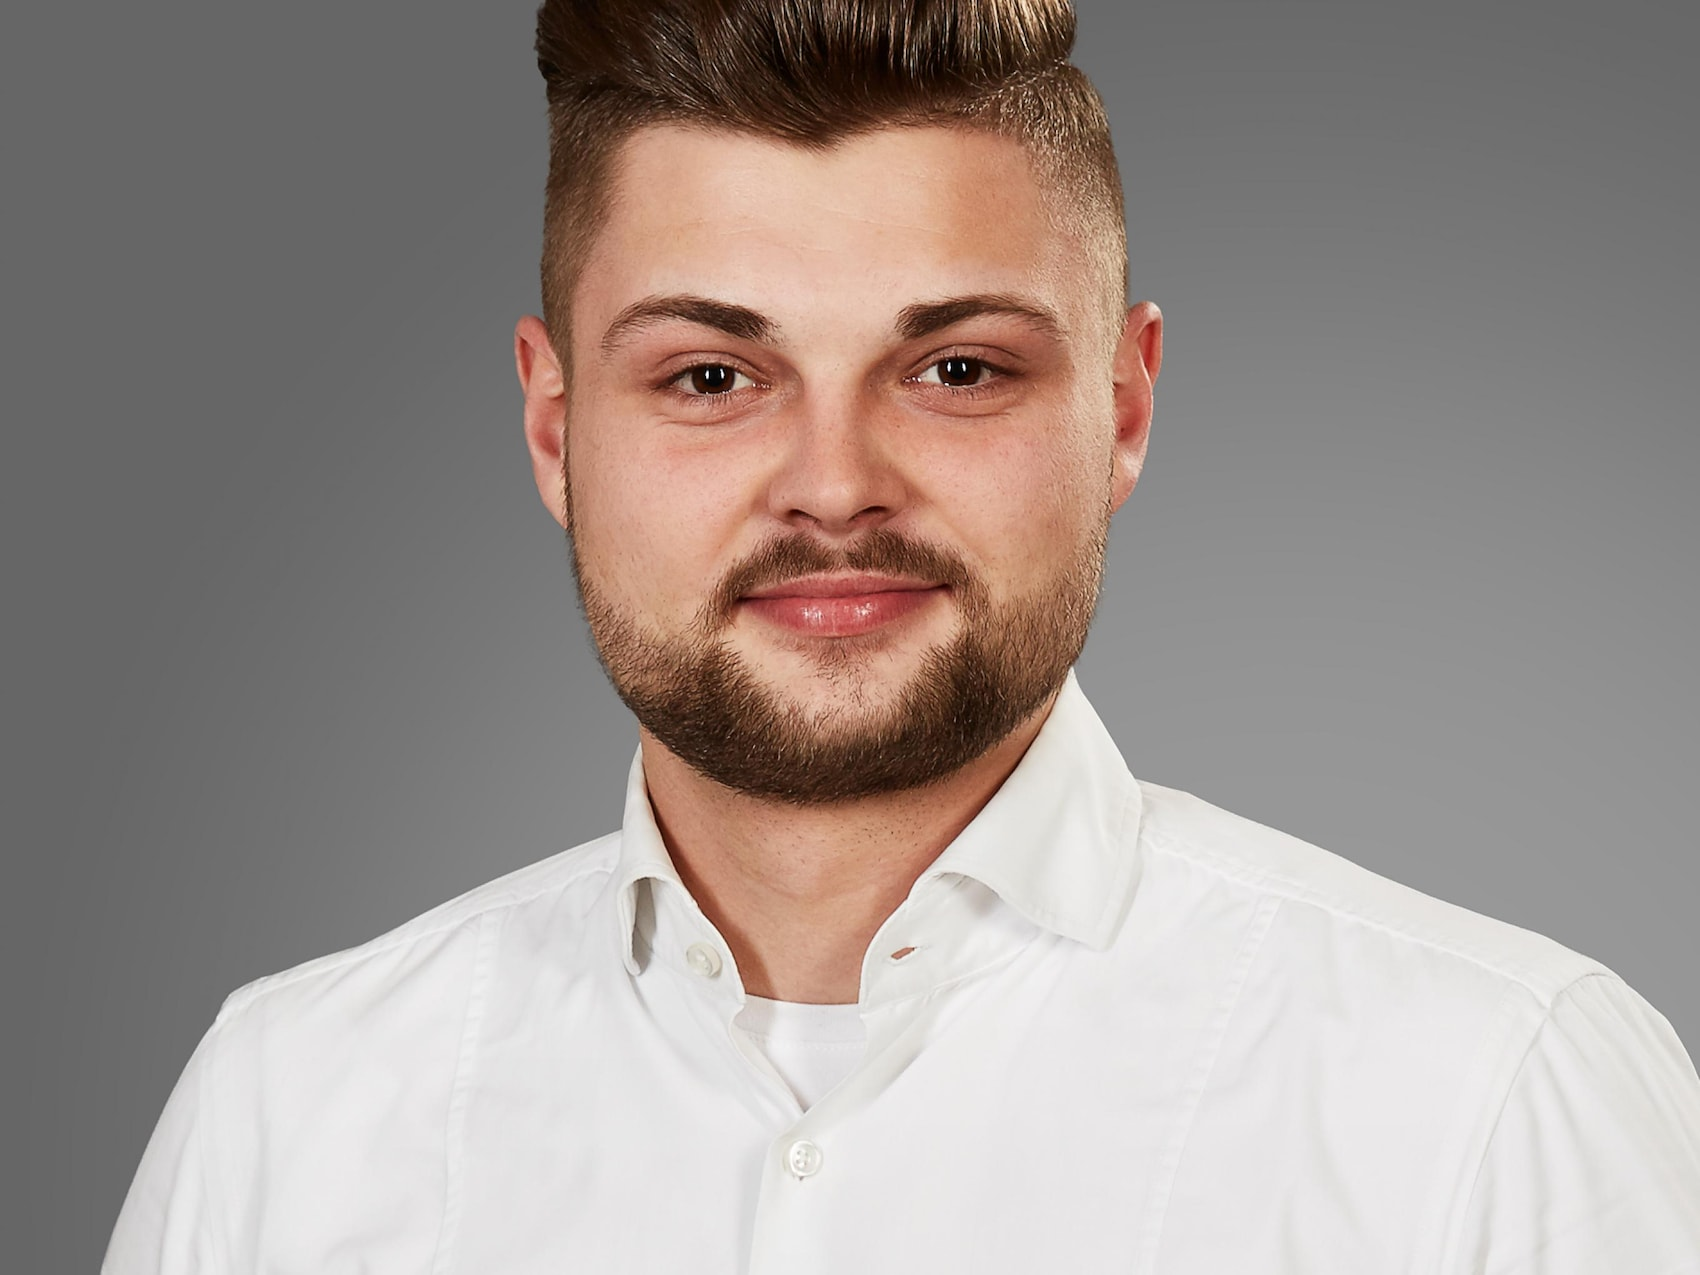 team-sc-Chemnitz-Lippmann-Felix